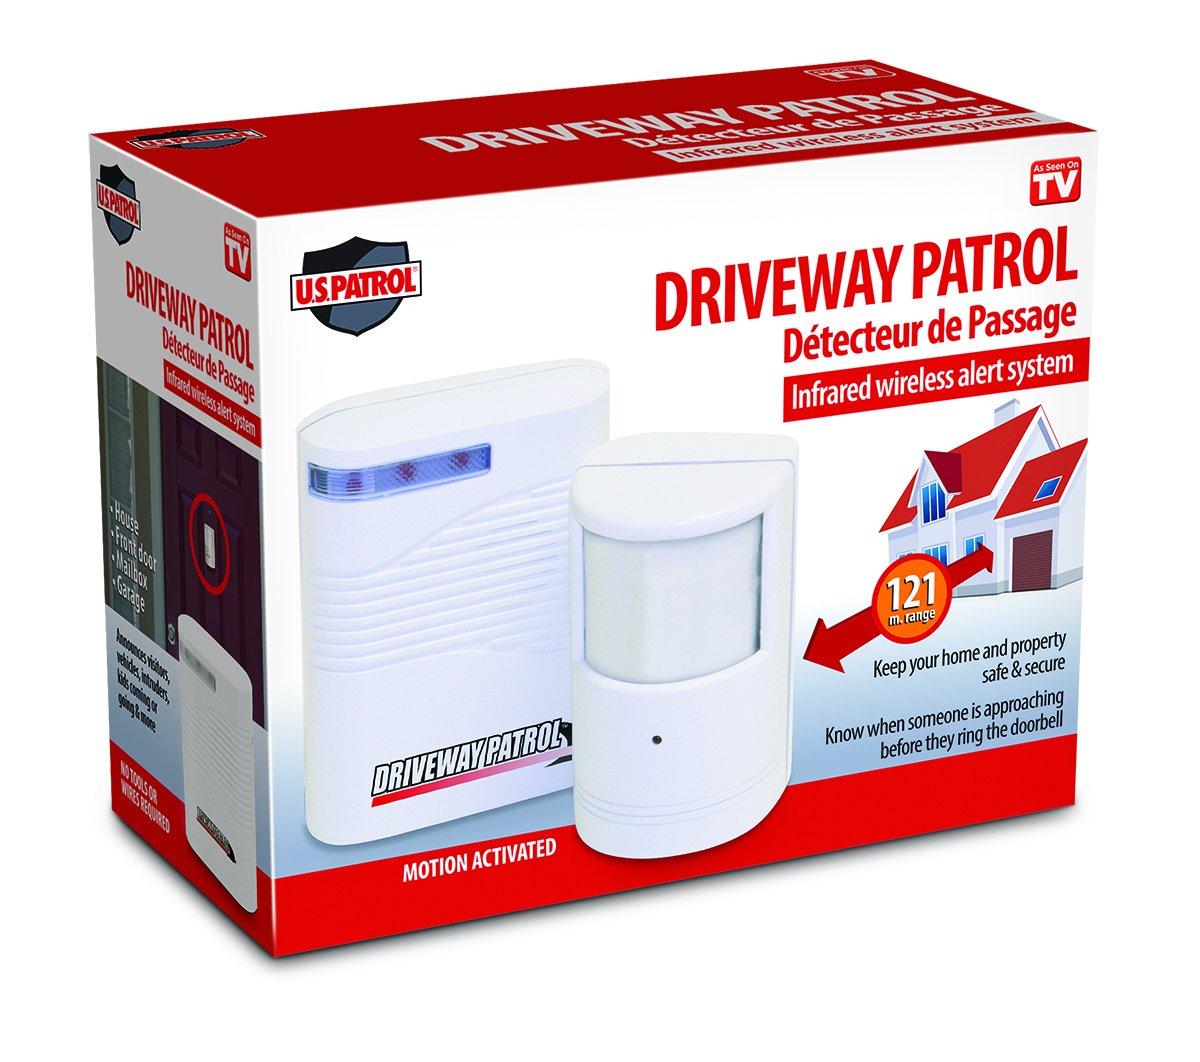 US Patrol Driveway Patrol Infrared Wireless Alert System Jobar Onternational E3731